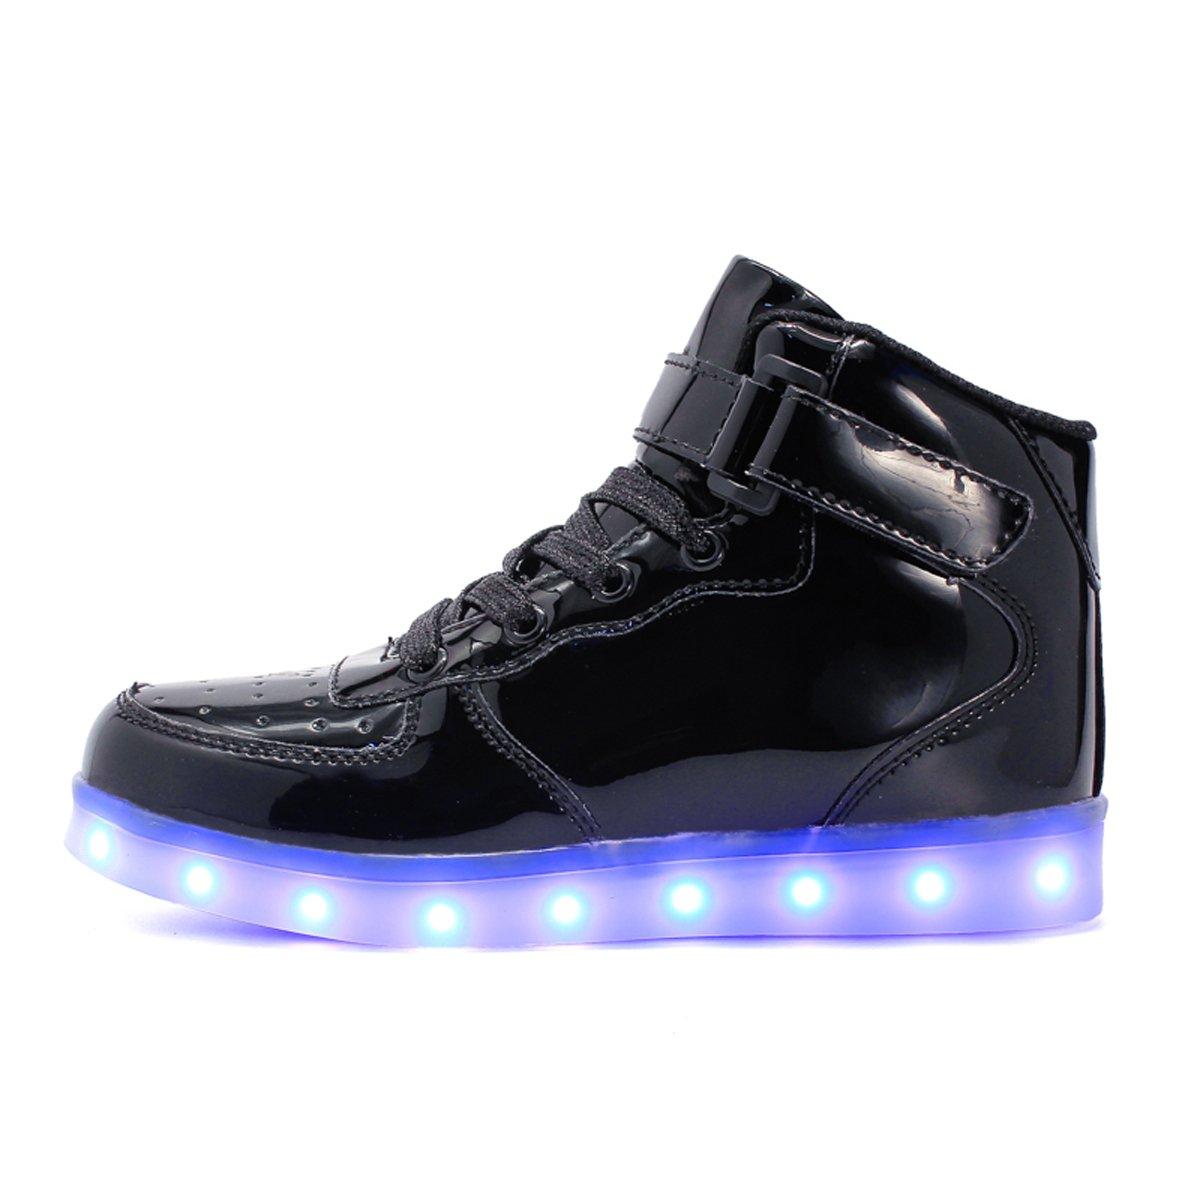 Maniamixx Kids LED Light up Shoes Flashing Sneakers High-Top USB Charging Shoes Boys Girls